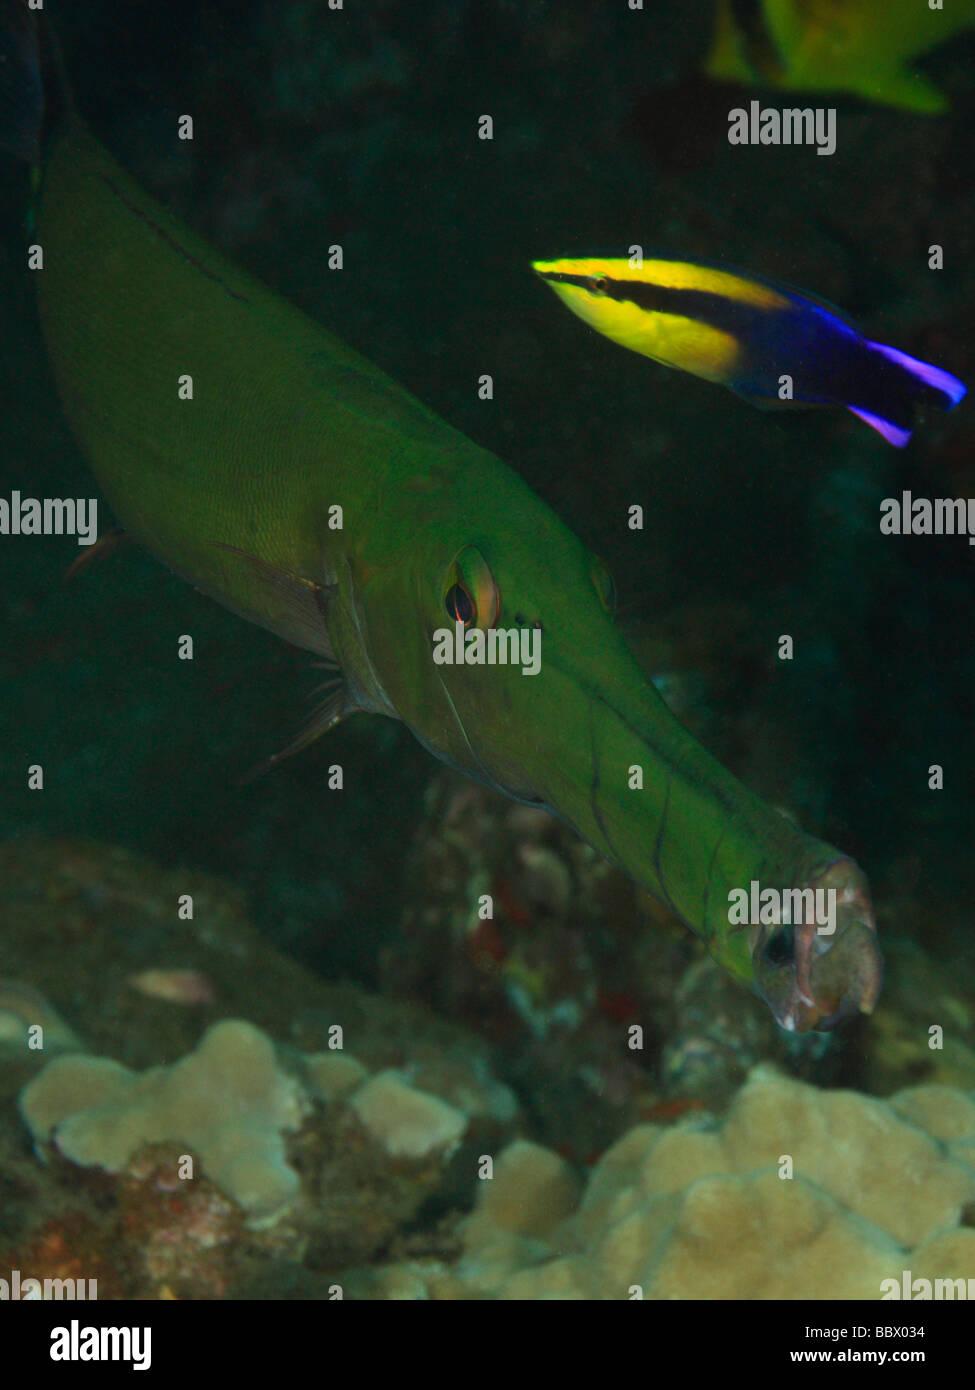 Giant Wrasse Fish Stockfotos & Giant Wrasse Fish Bilder - Alamy